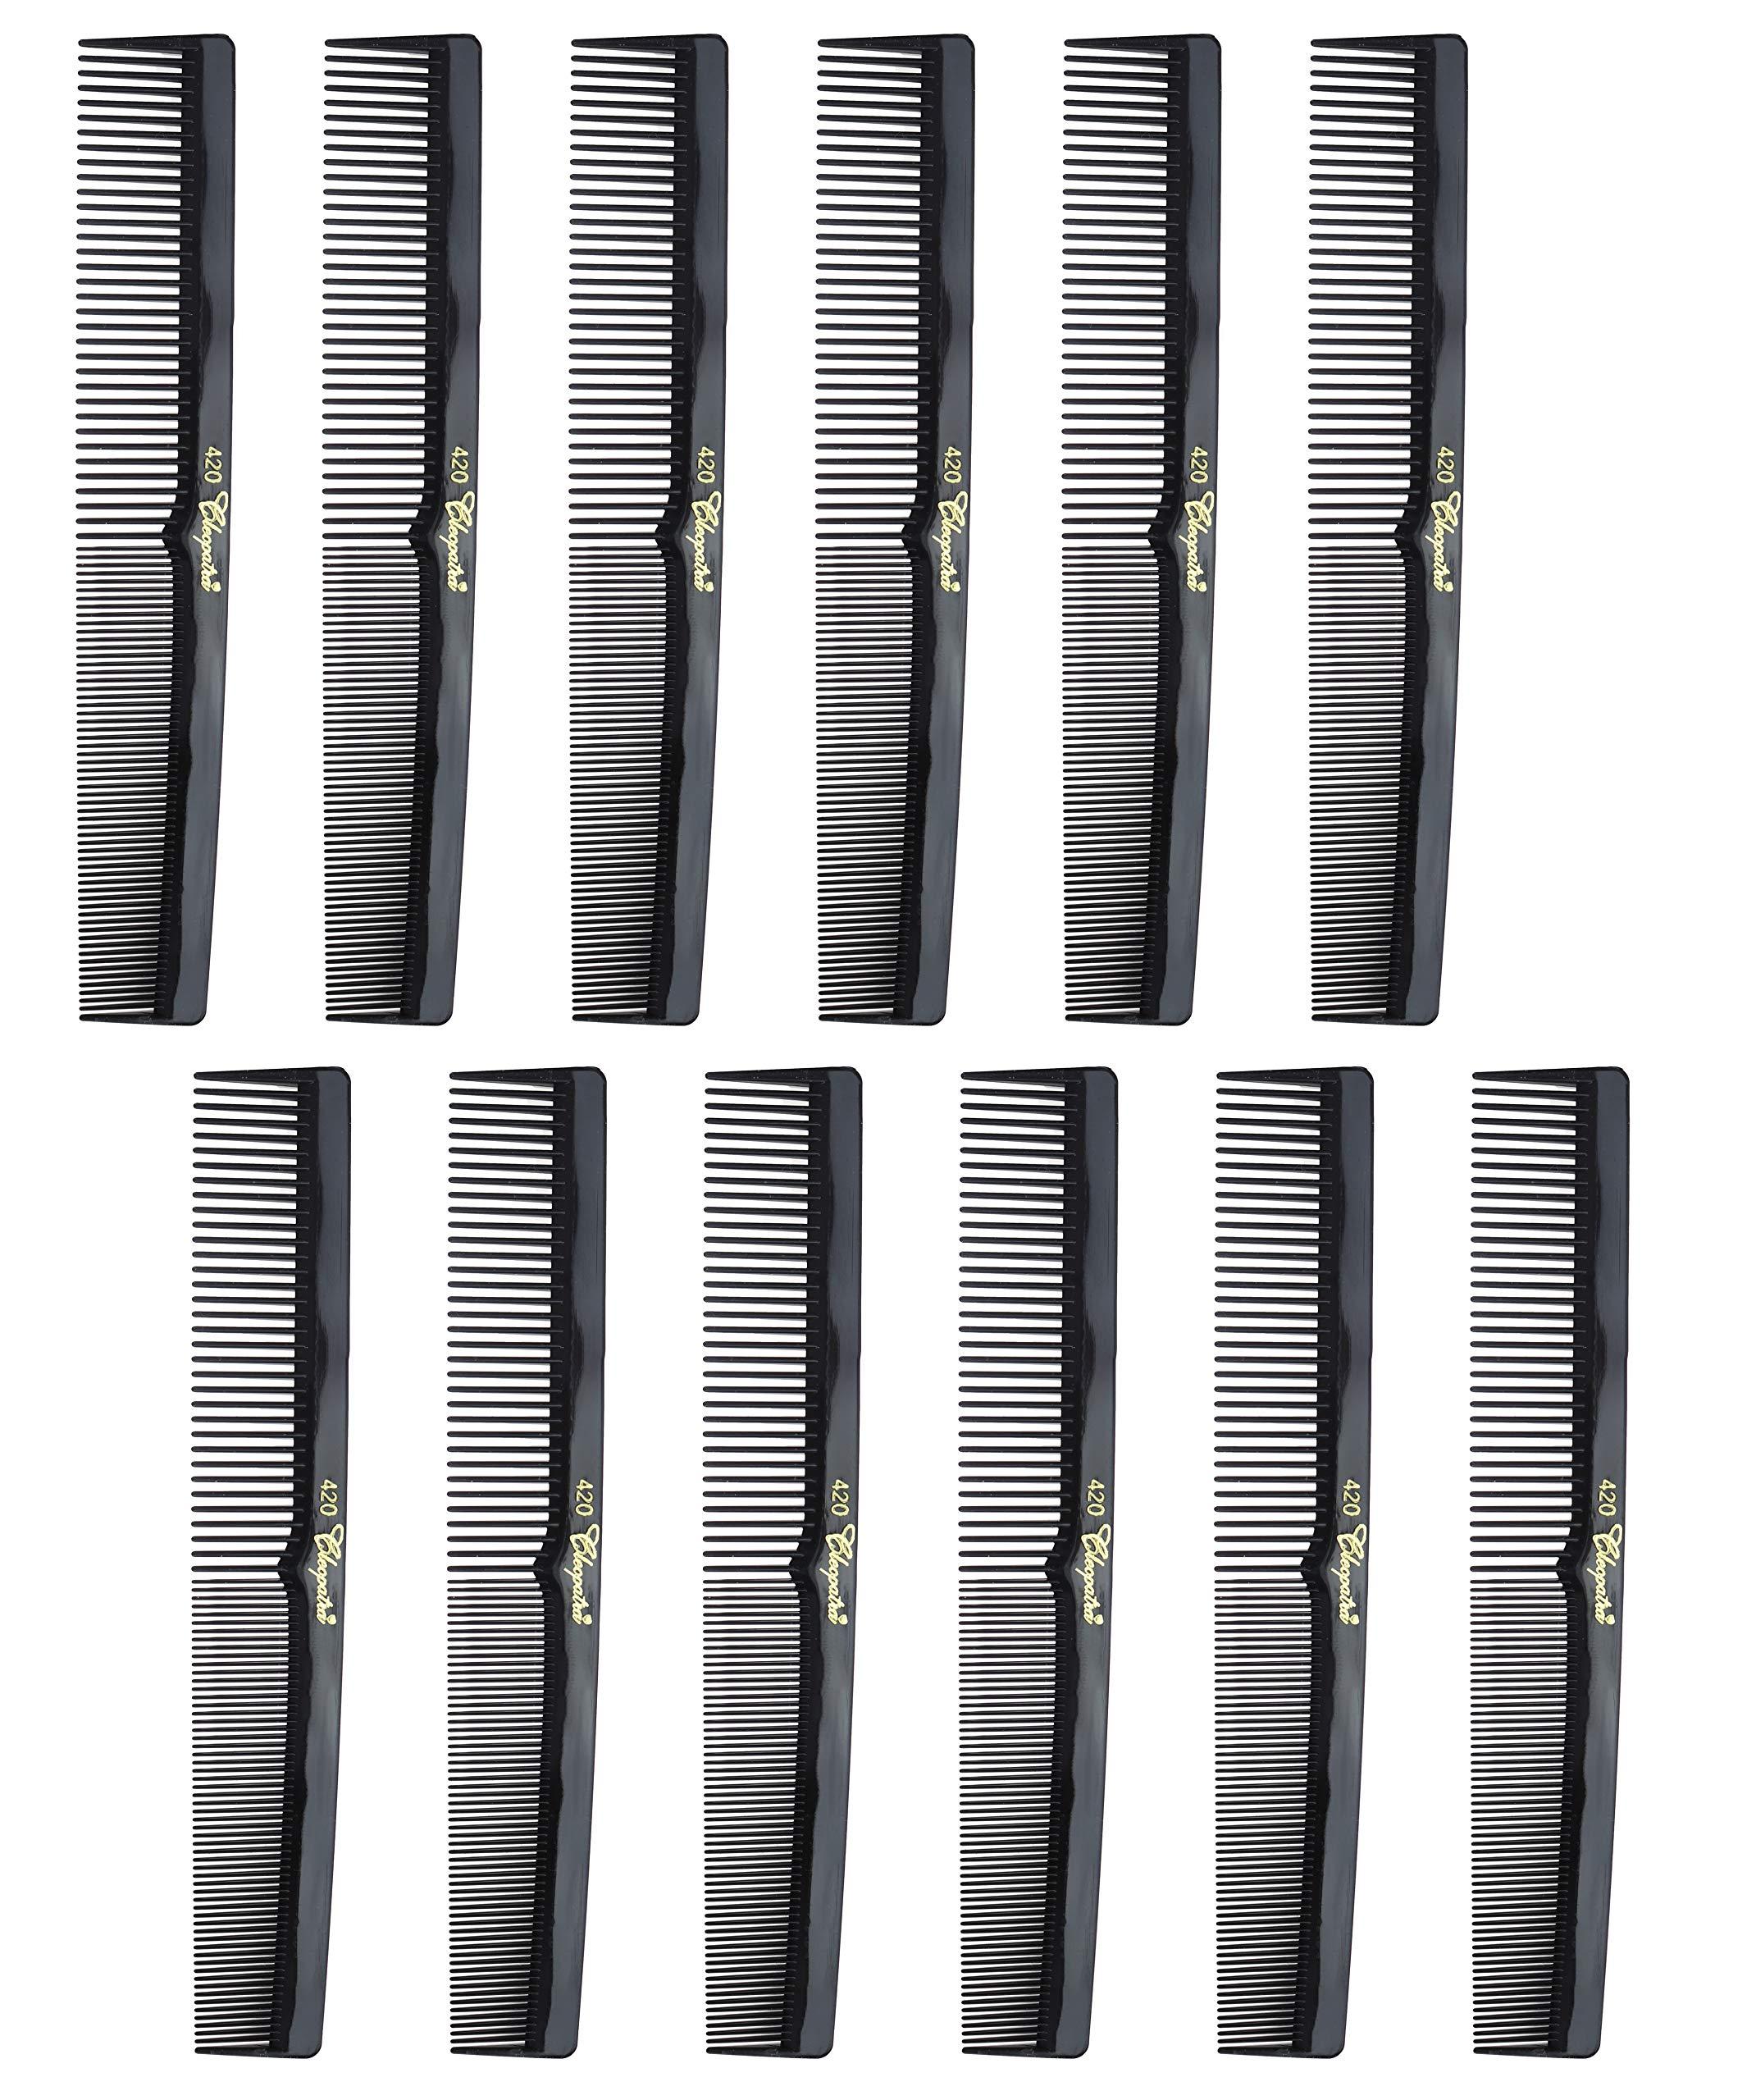 Barber Cleopatra 420 7″ Flat Square Back Hair Comb (12 Pack) 12 x SB-C420-BLK